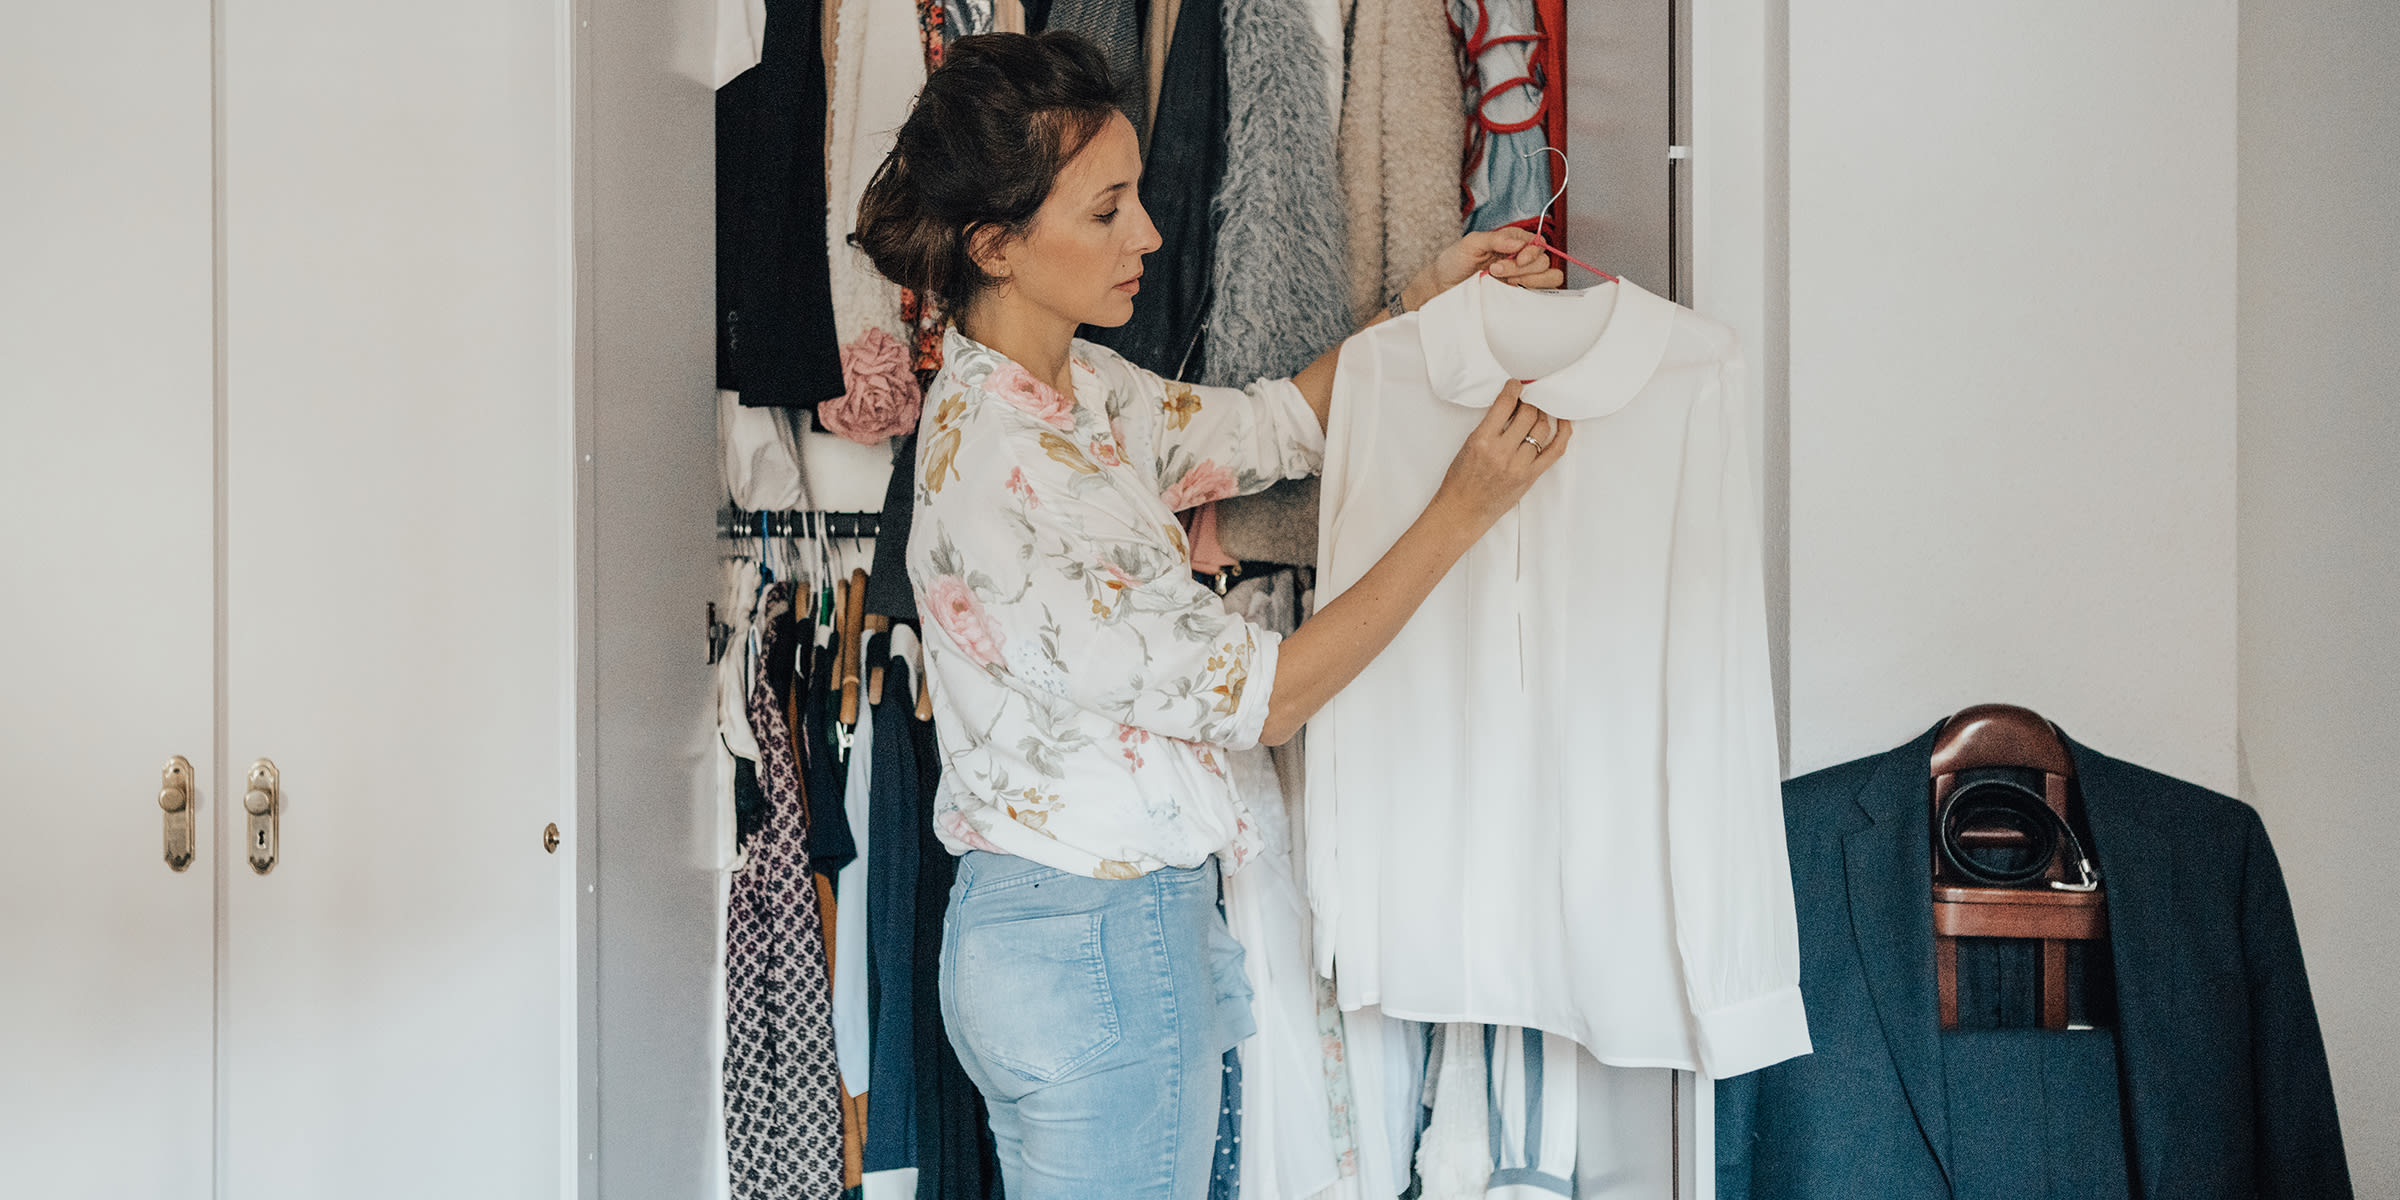 Woman refreshing wardrobe